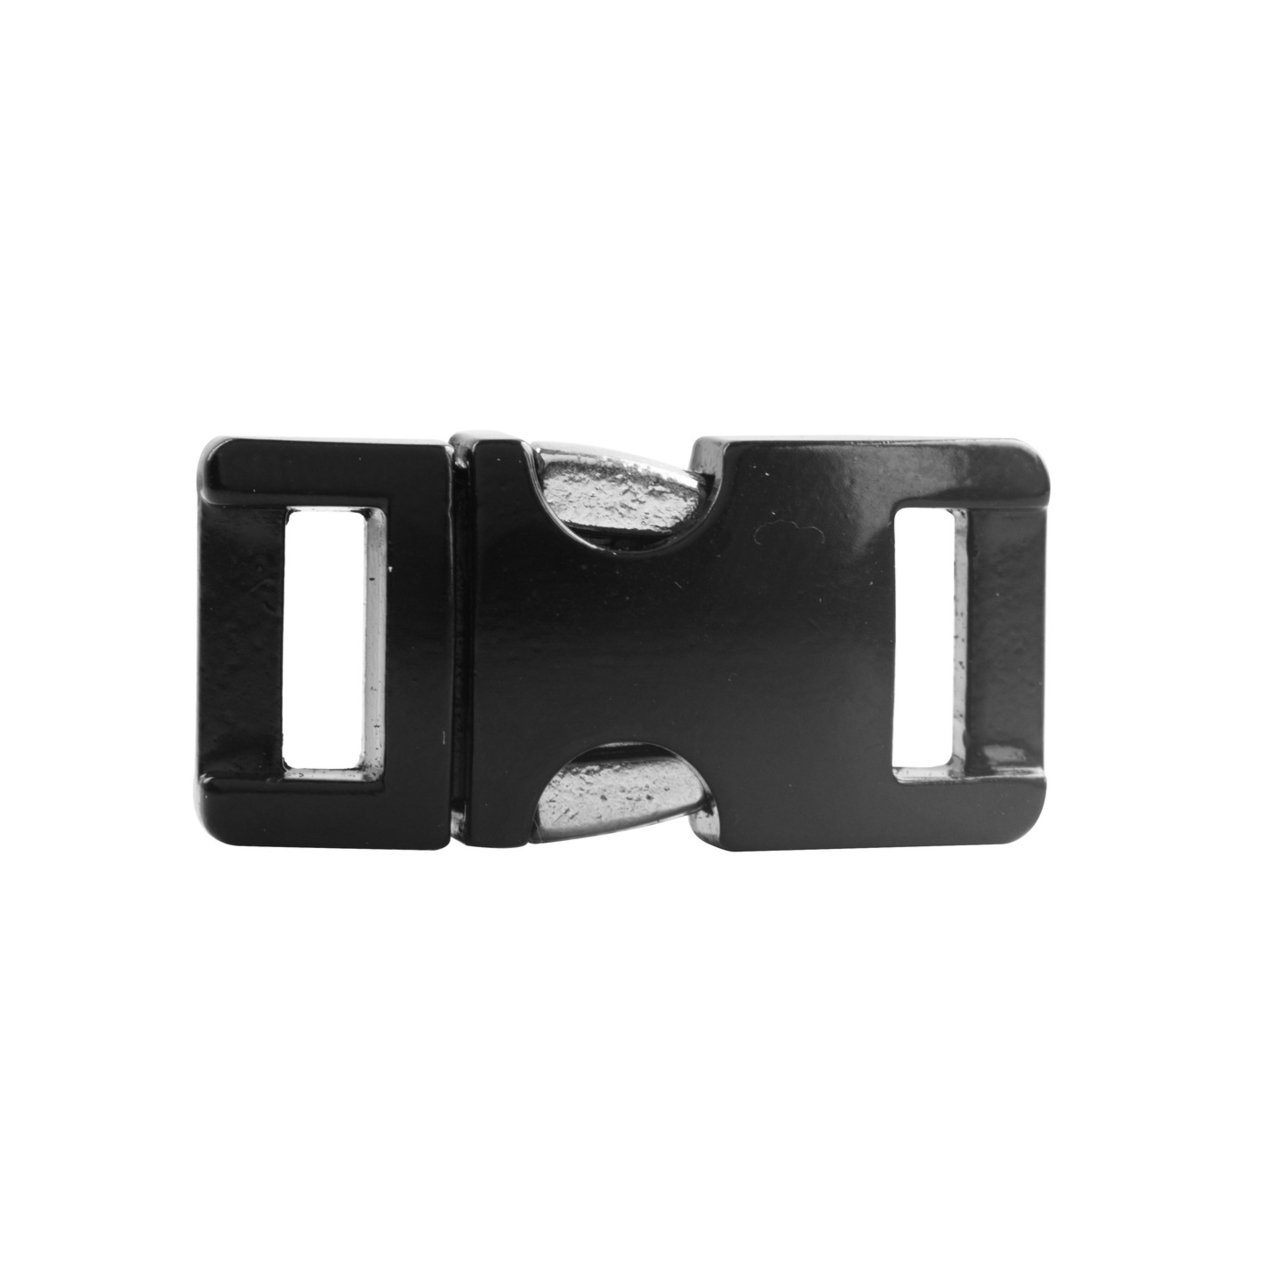 Aluminium Buckle Black 3/8 (10 mm).